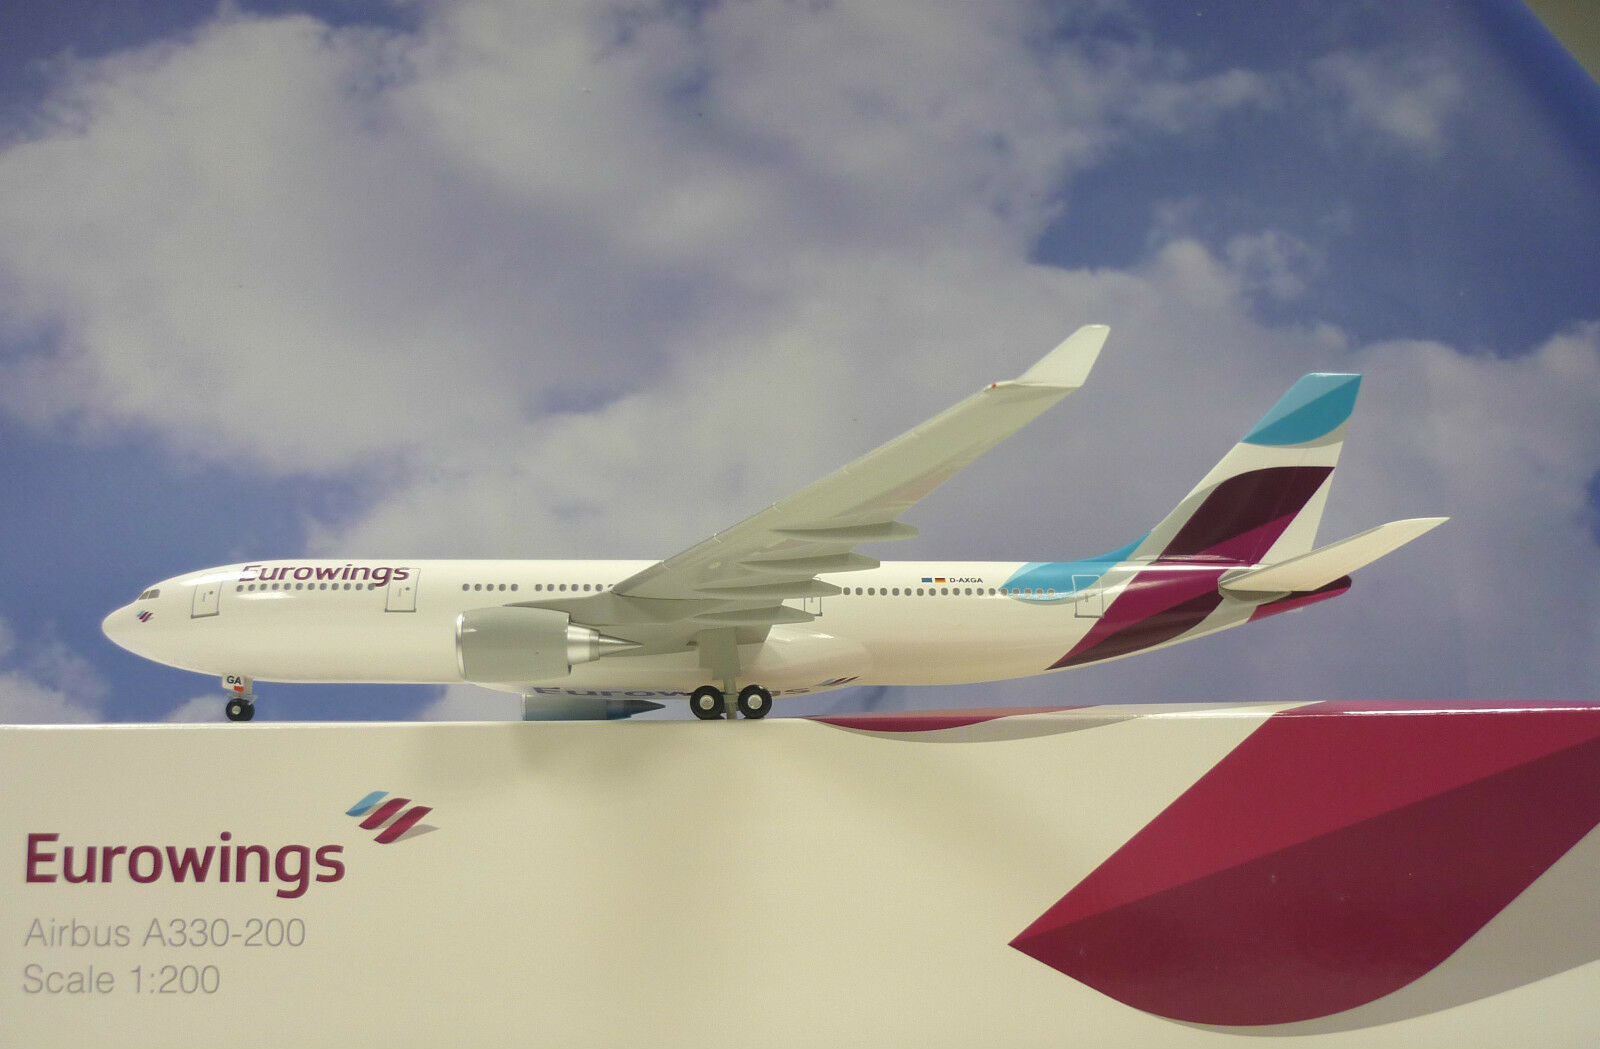 Limox Wings 1 200 Airbus A330-200 Eurowings D-Axga EW03  Ailes de Herpa Katalog